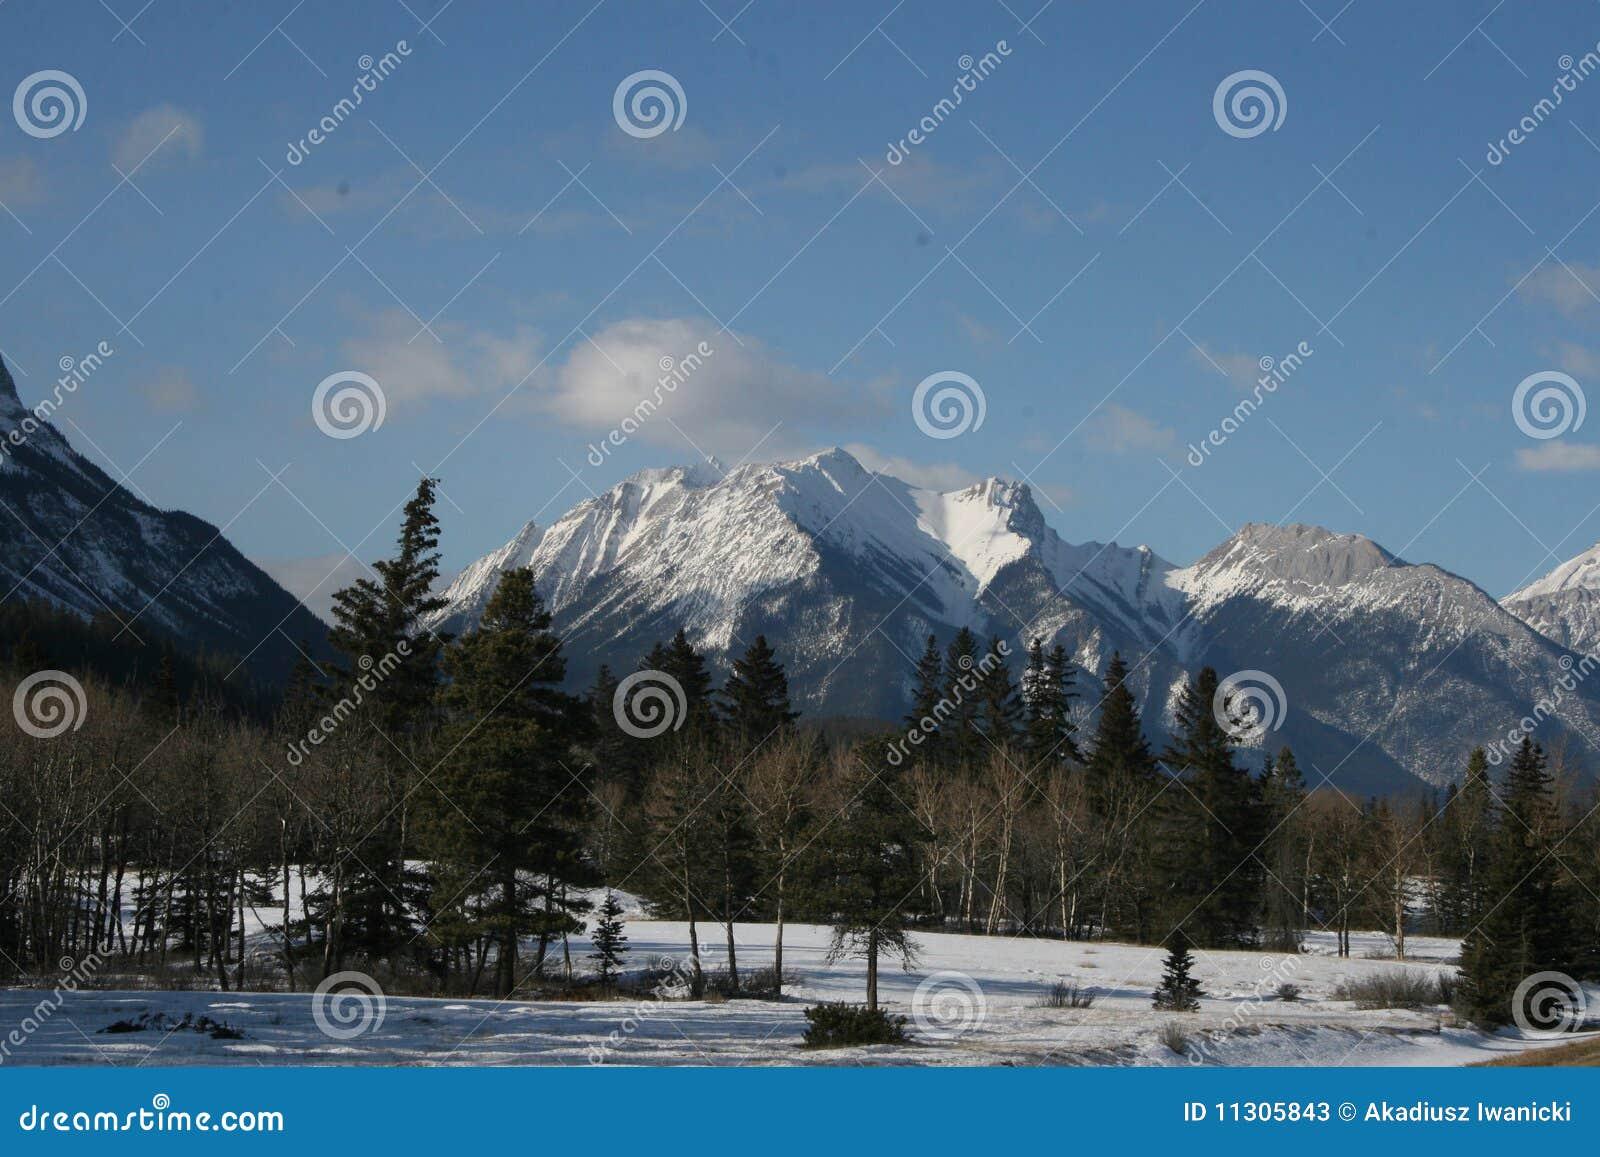 Felsige Berge und Wald